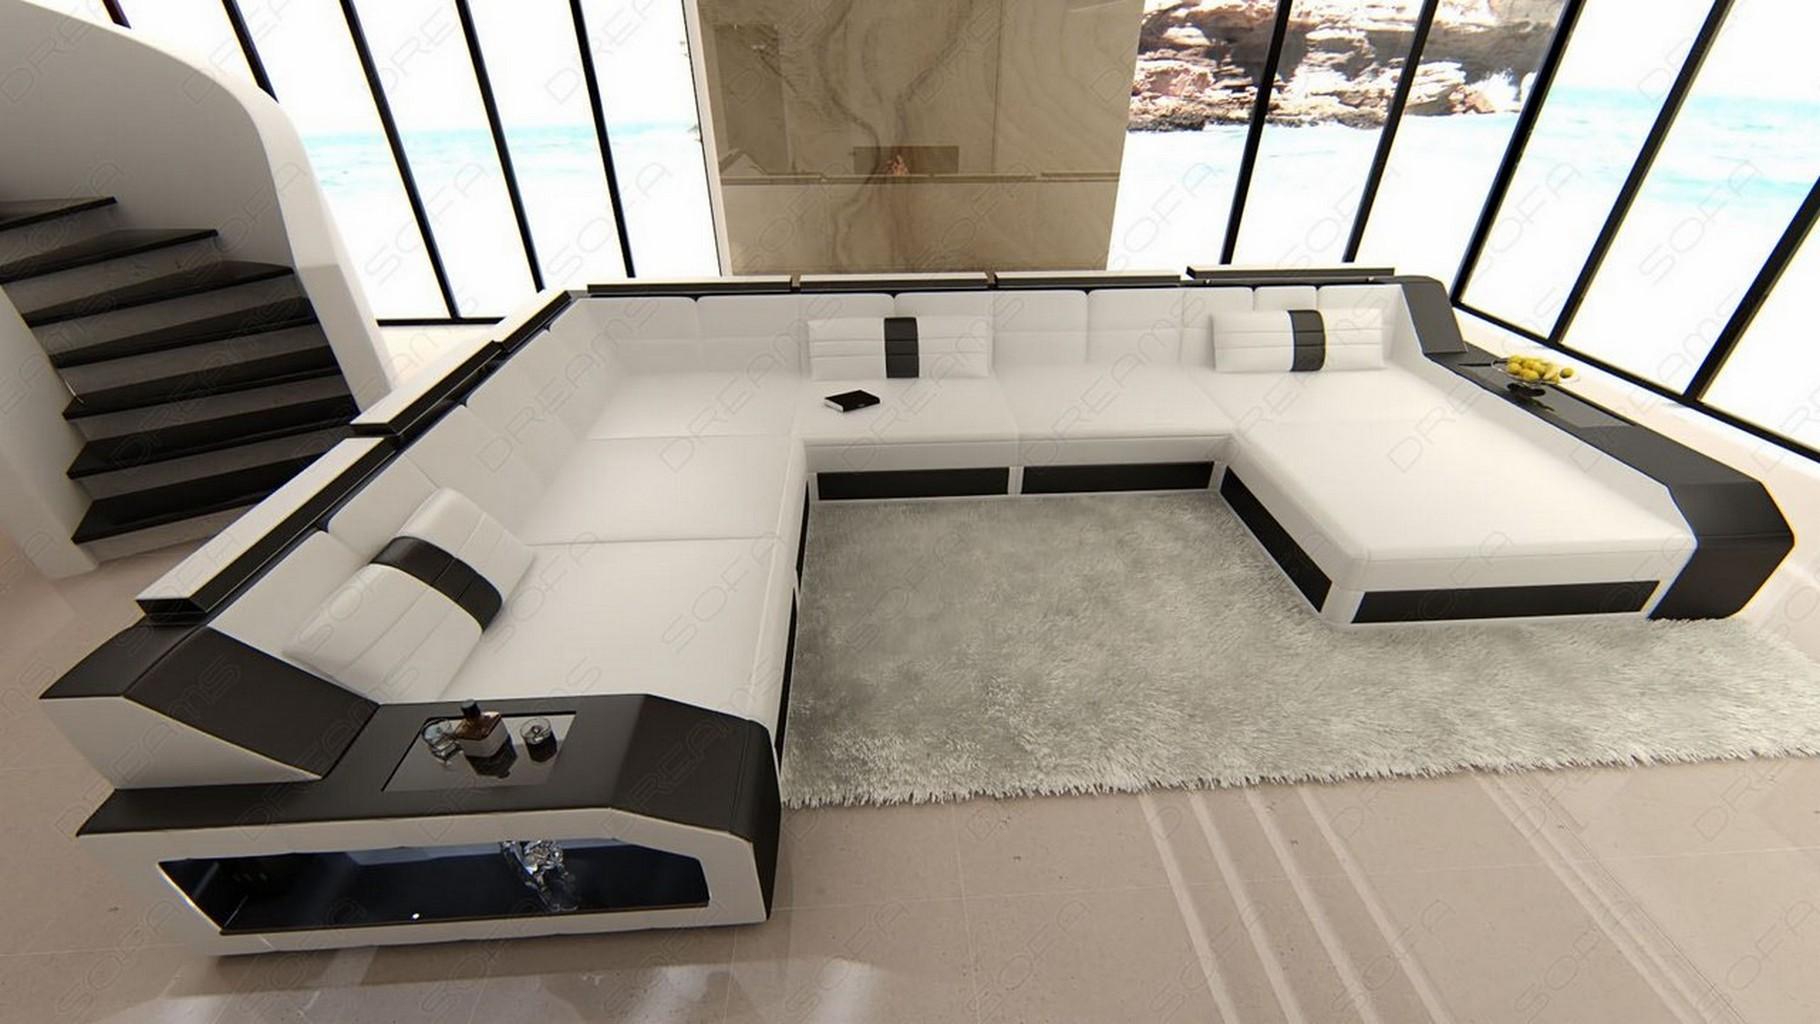 ledersofa wohnlandschaft matera u form mit led beleuchtung weiss schwarz ebay. Black Bedroom Furniture Sets. Home Design Ideas